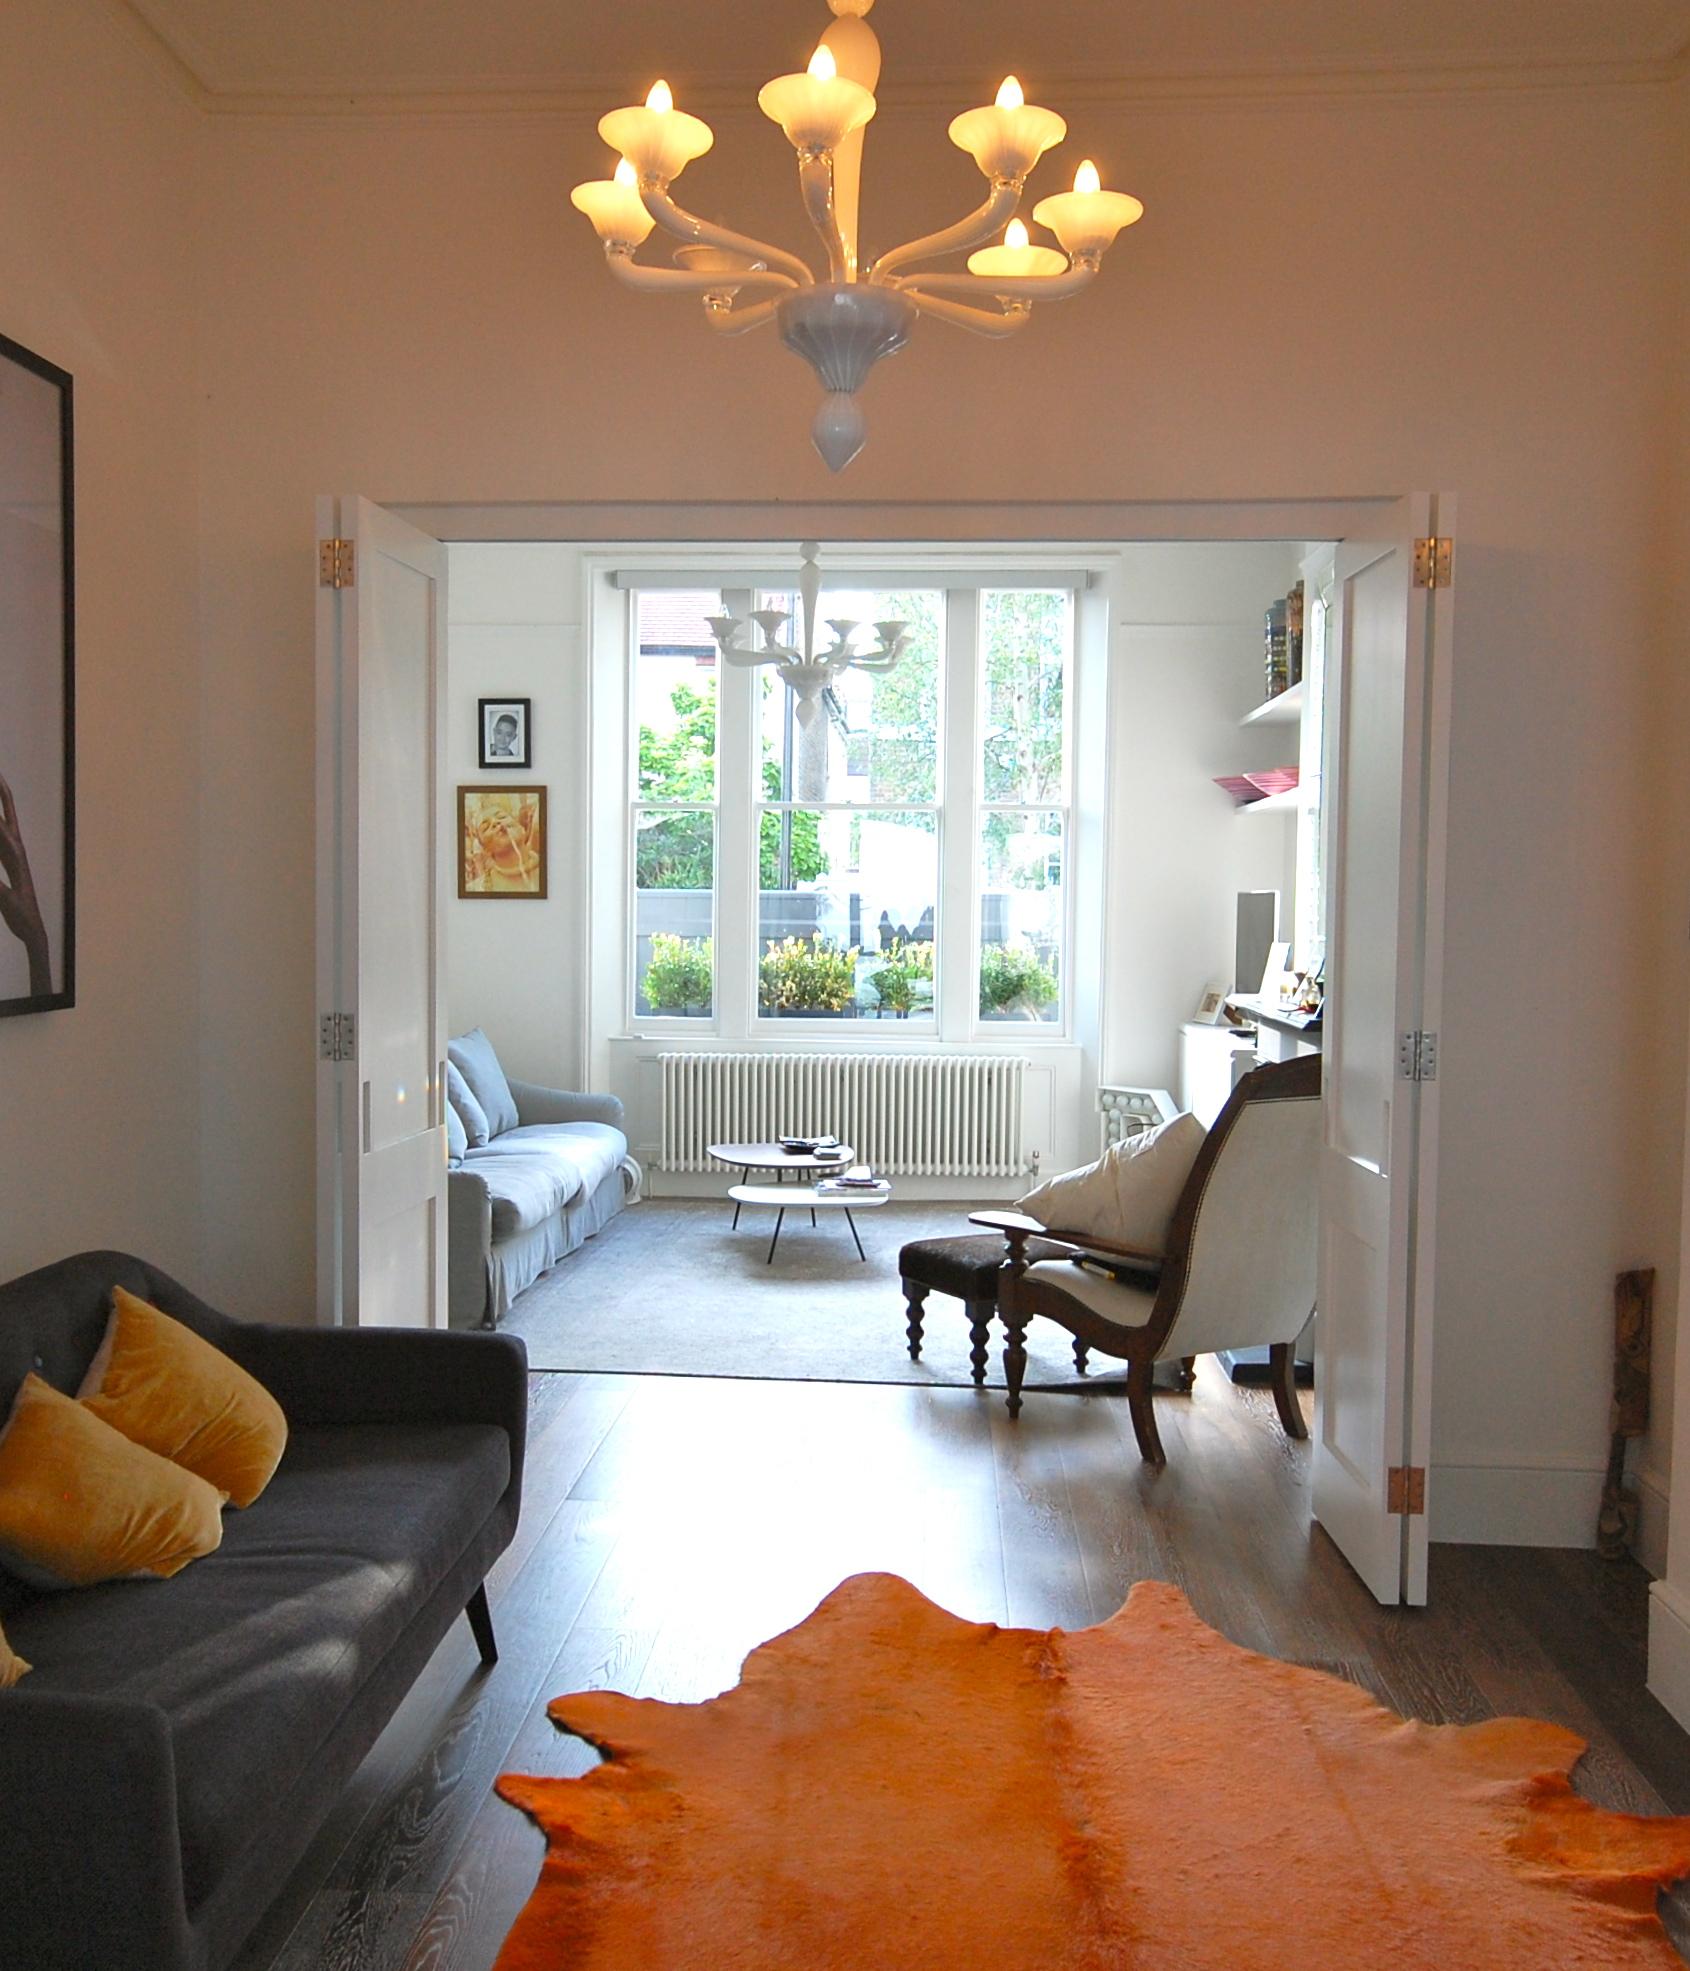 Grain_Bespoke_Furniture_White_Sprayed_Room_Divider_Sideboard.jpg